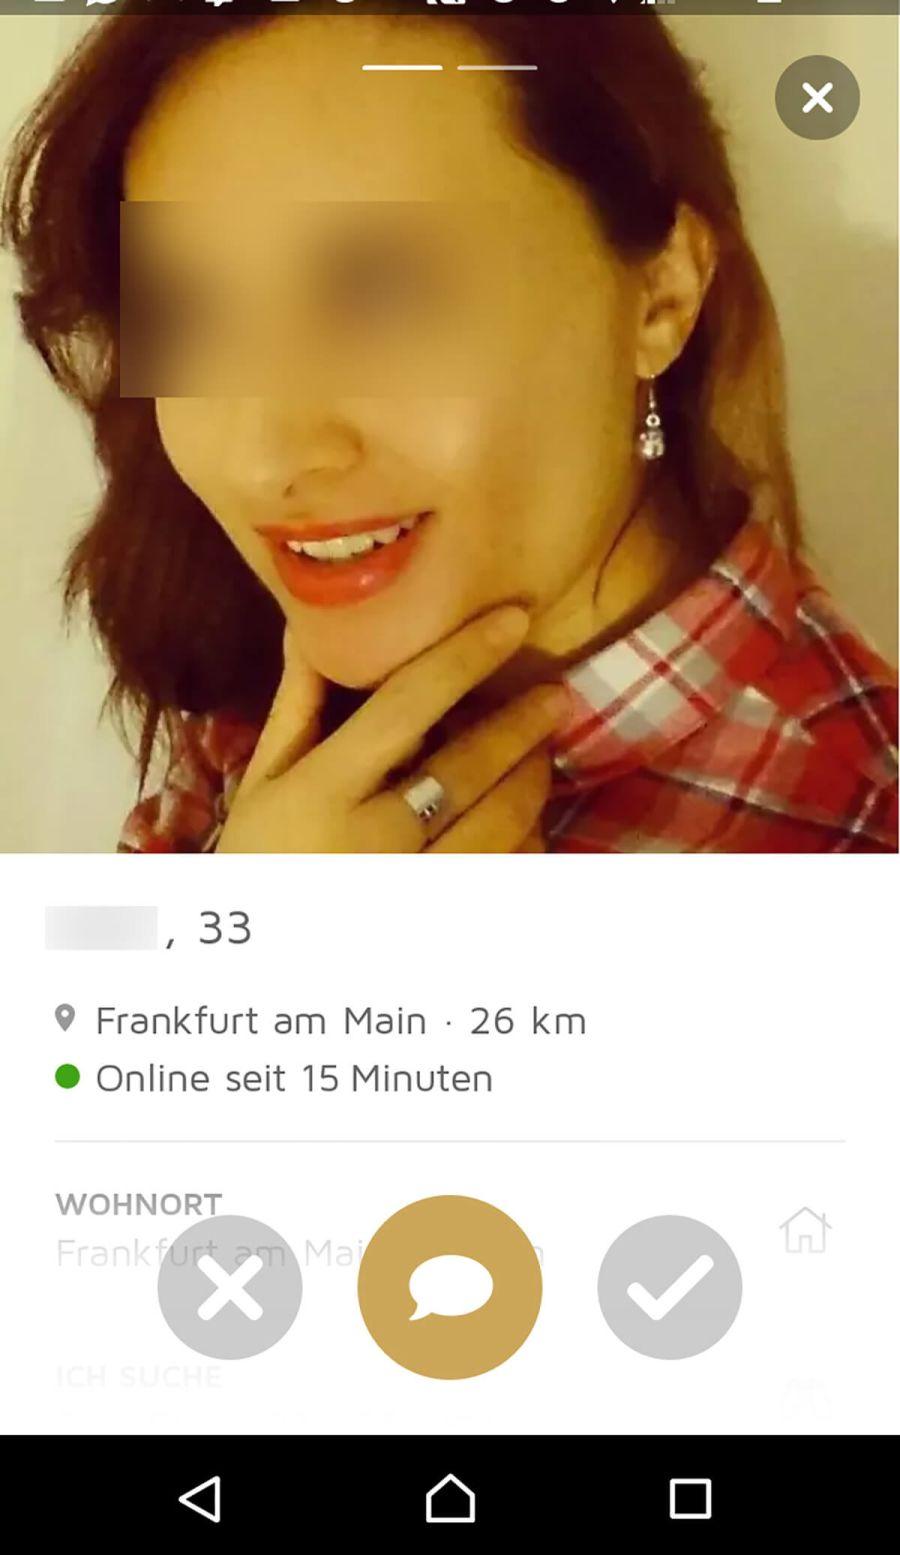 YouLove Frauenprofil